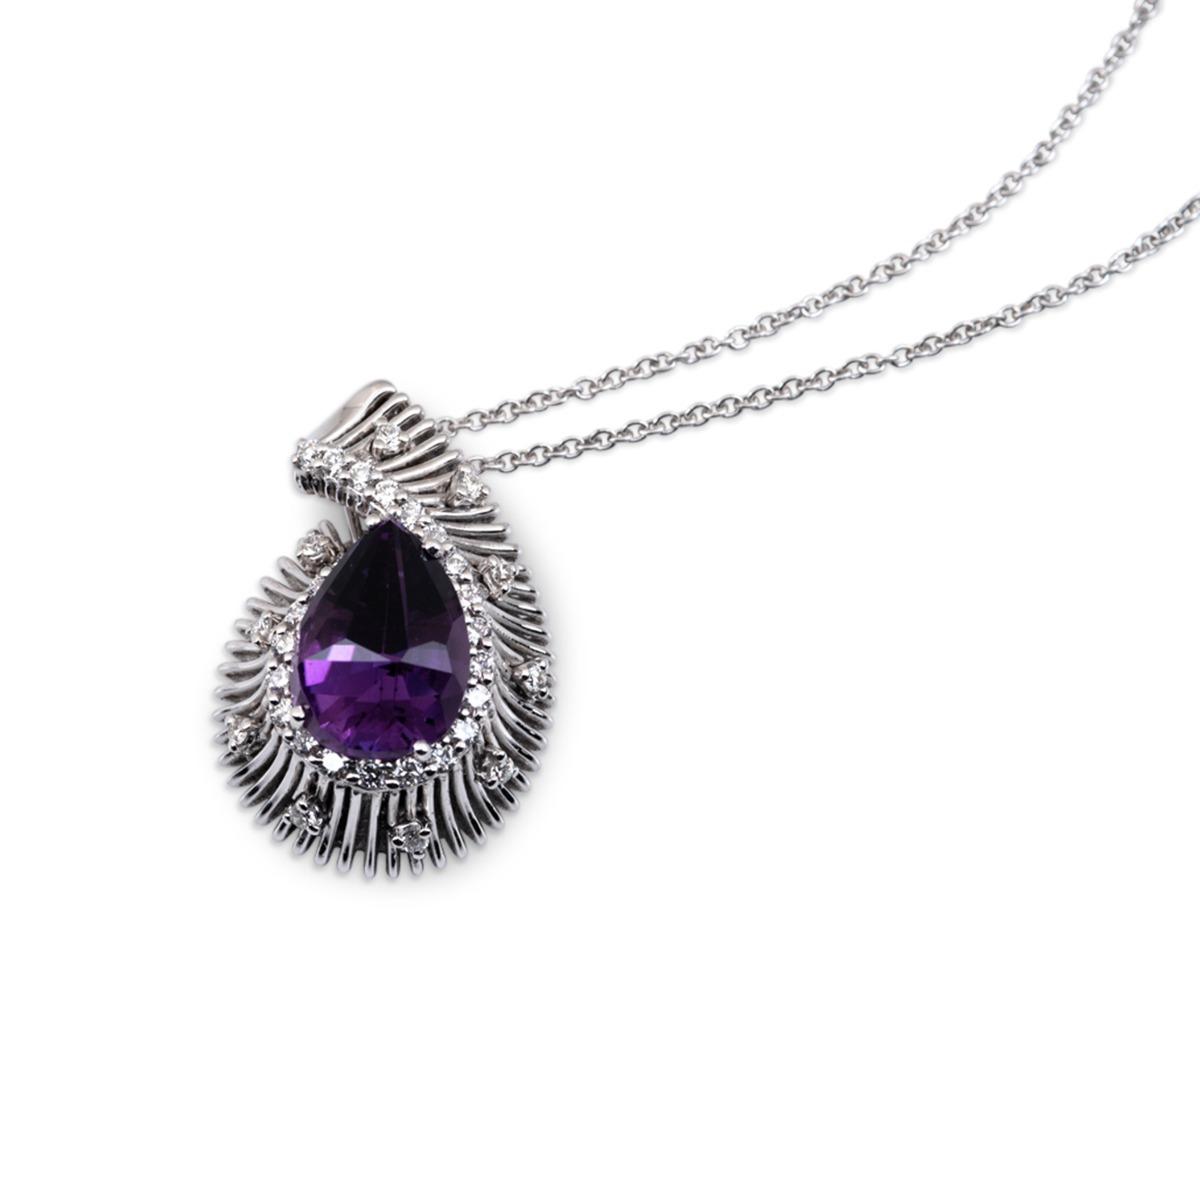 Pear-Cut Purple Amethyst Pendant Necklace